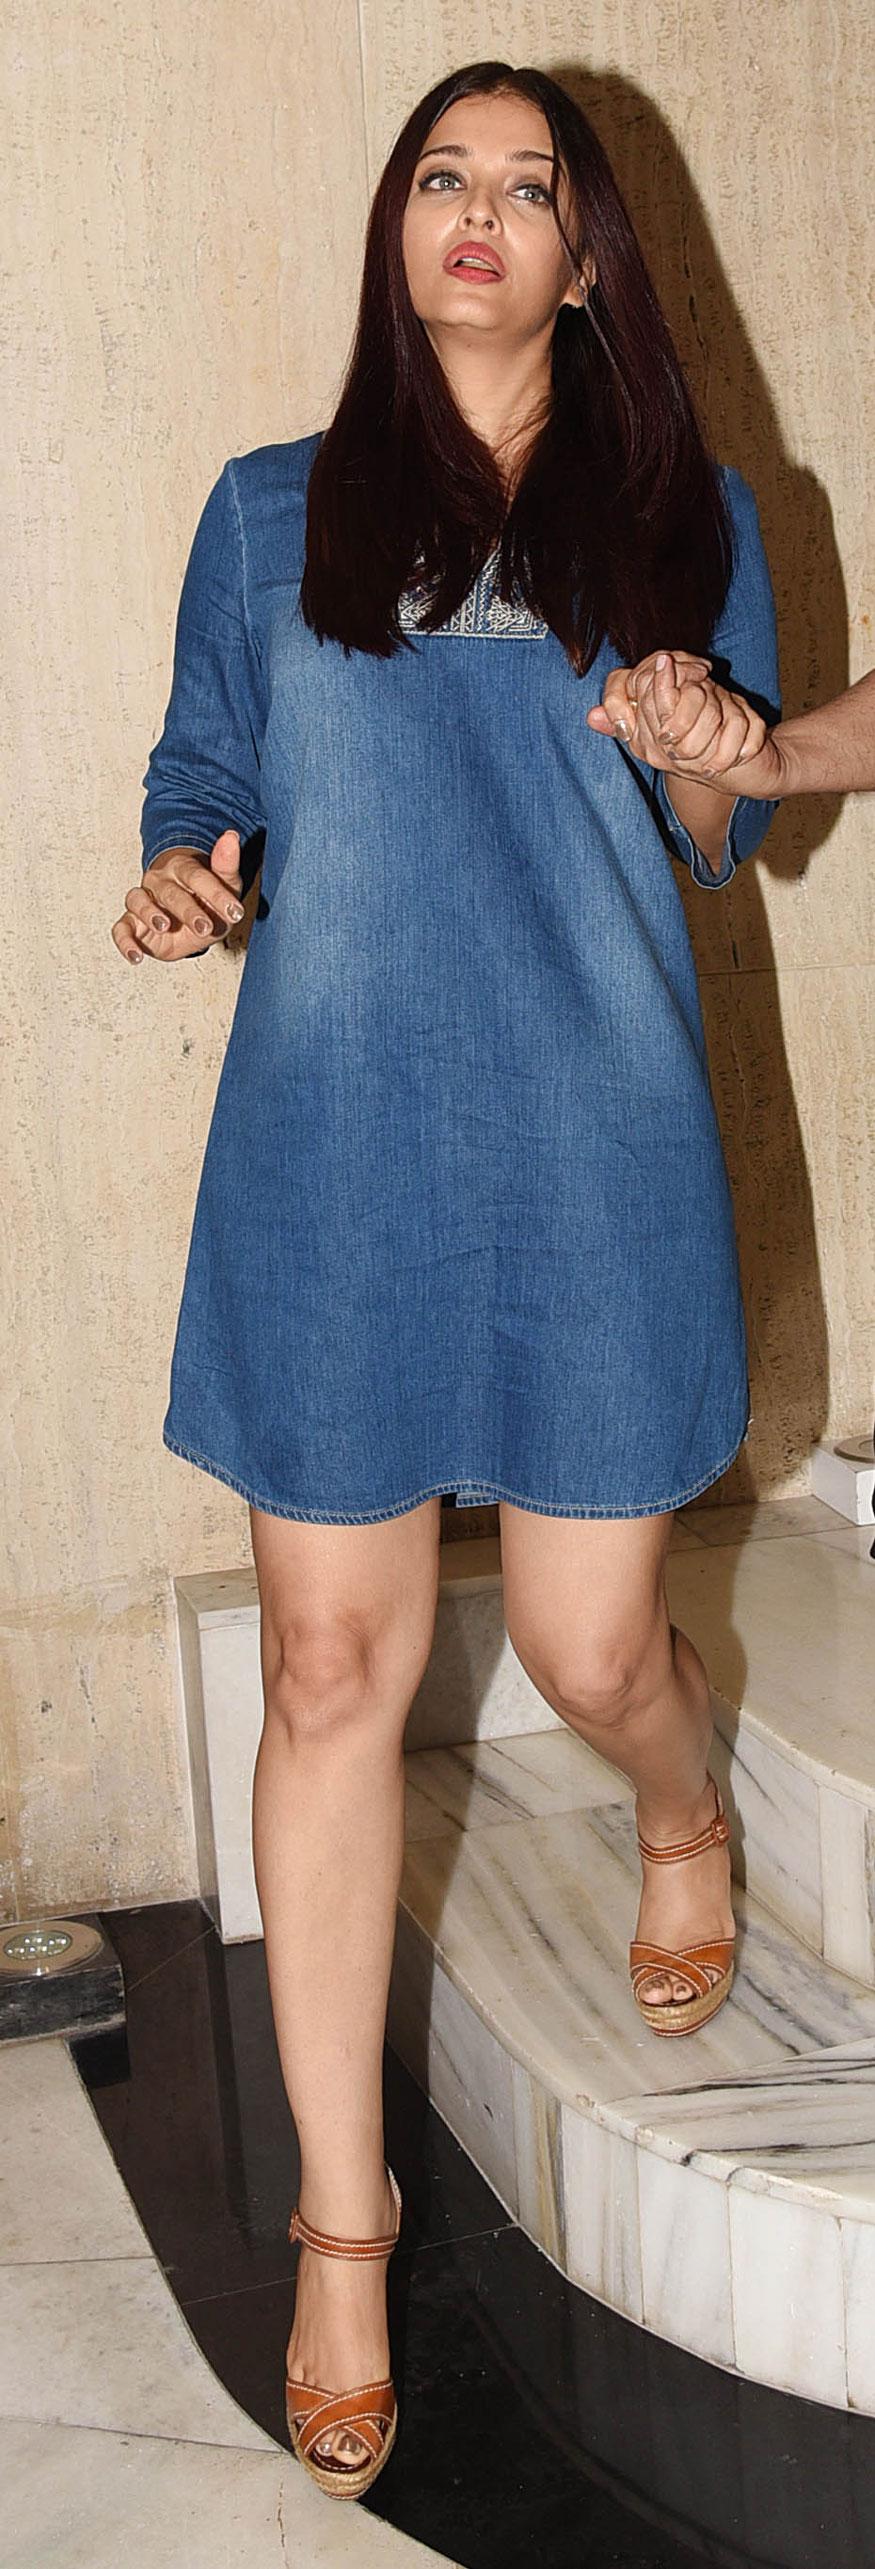 [Image: Aishwarya-Rai-Bachchan.jpg]